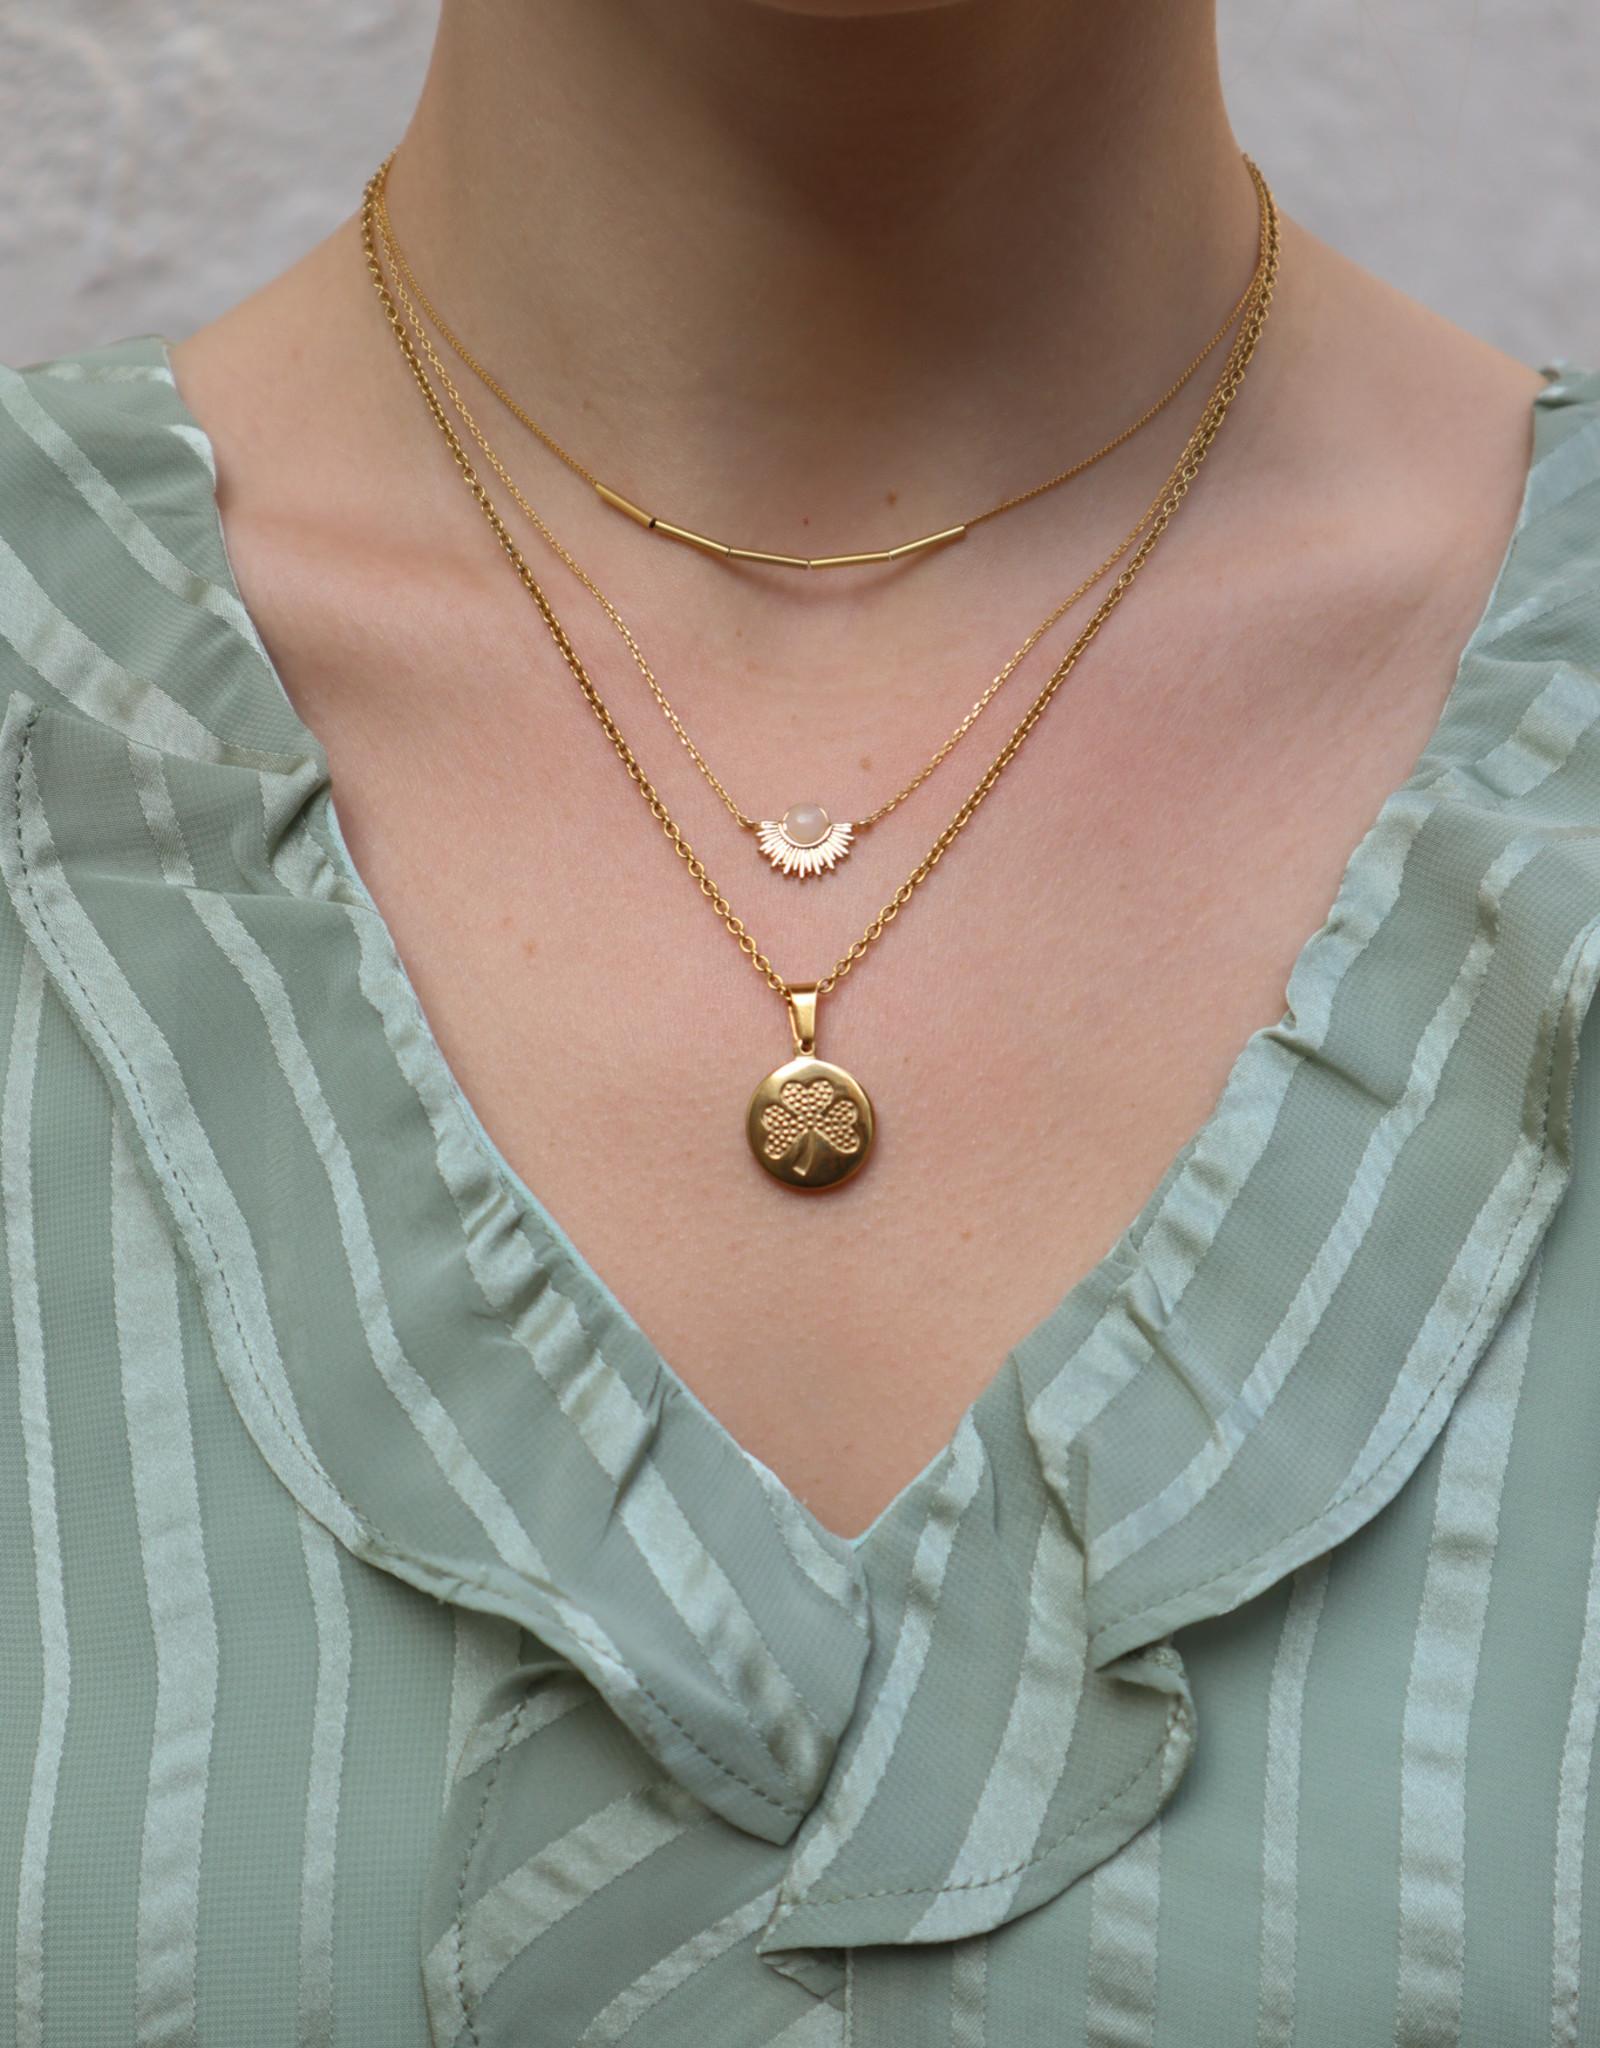 All the Luck in the World All the Luck in the World Necklace Galaxy Sun/Rquartz Gold